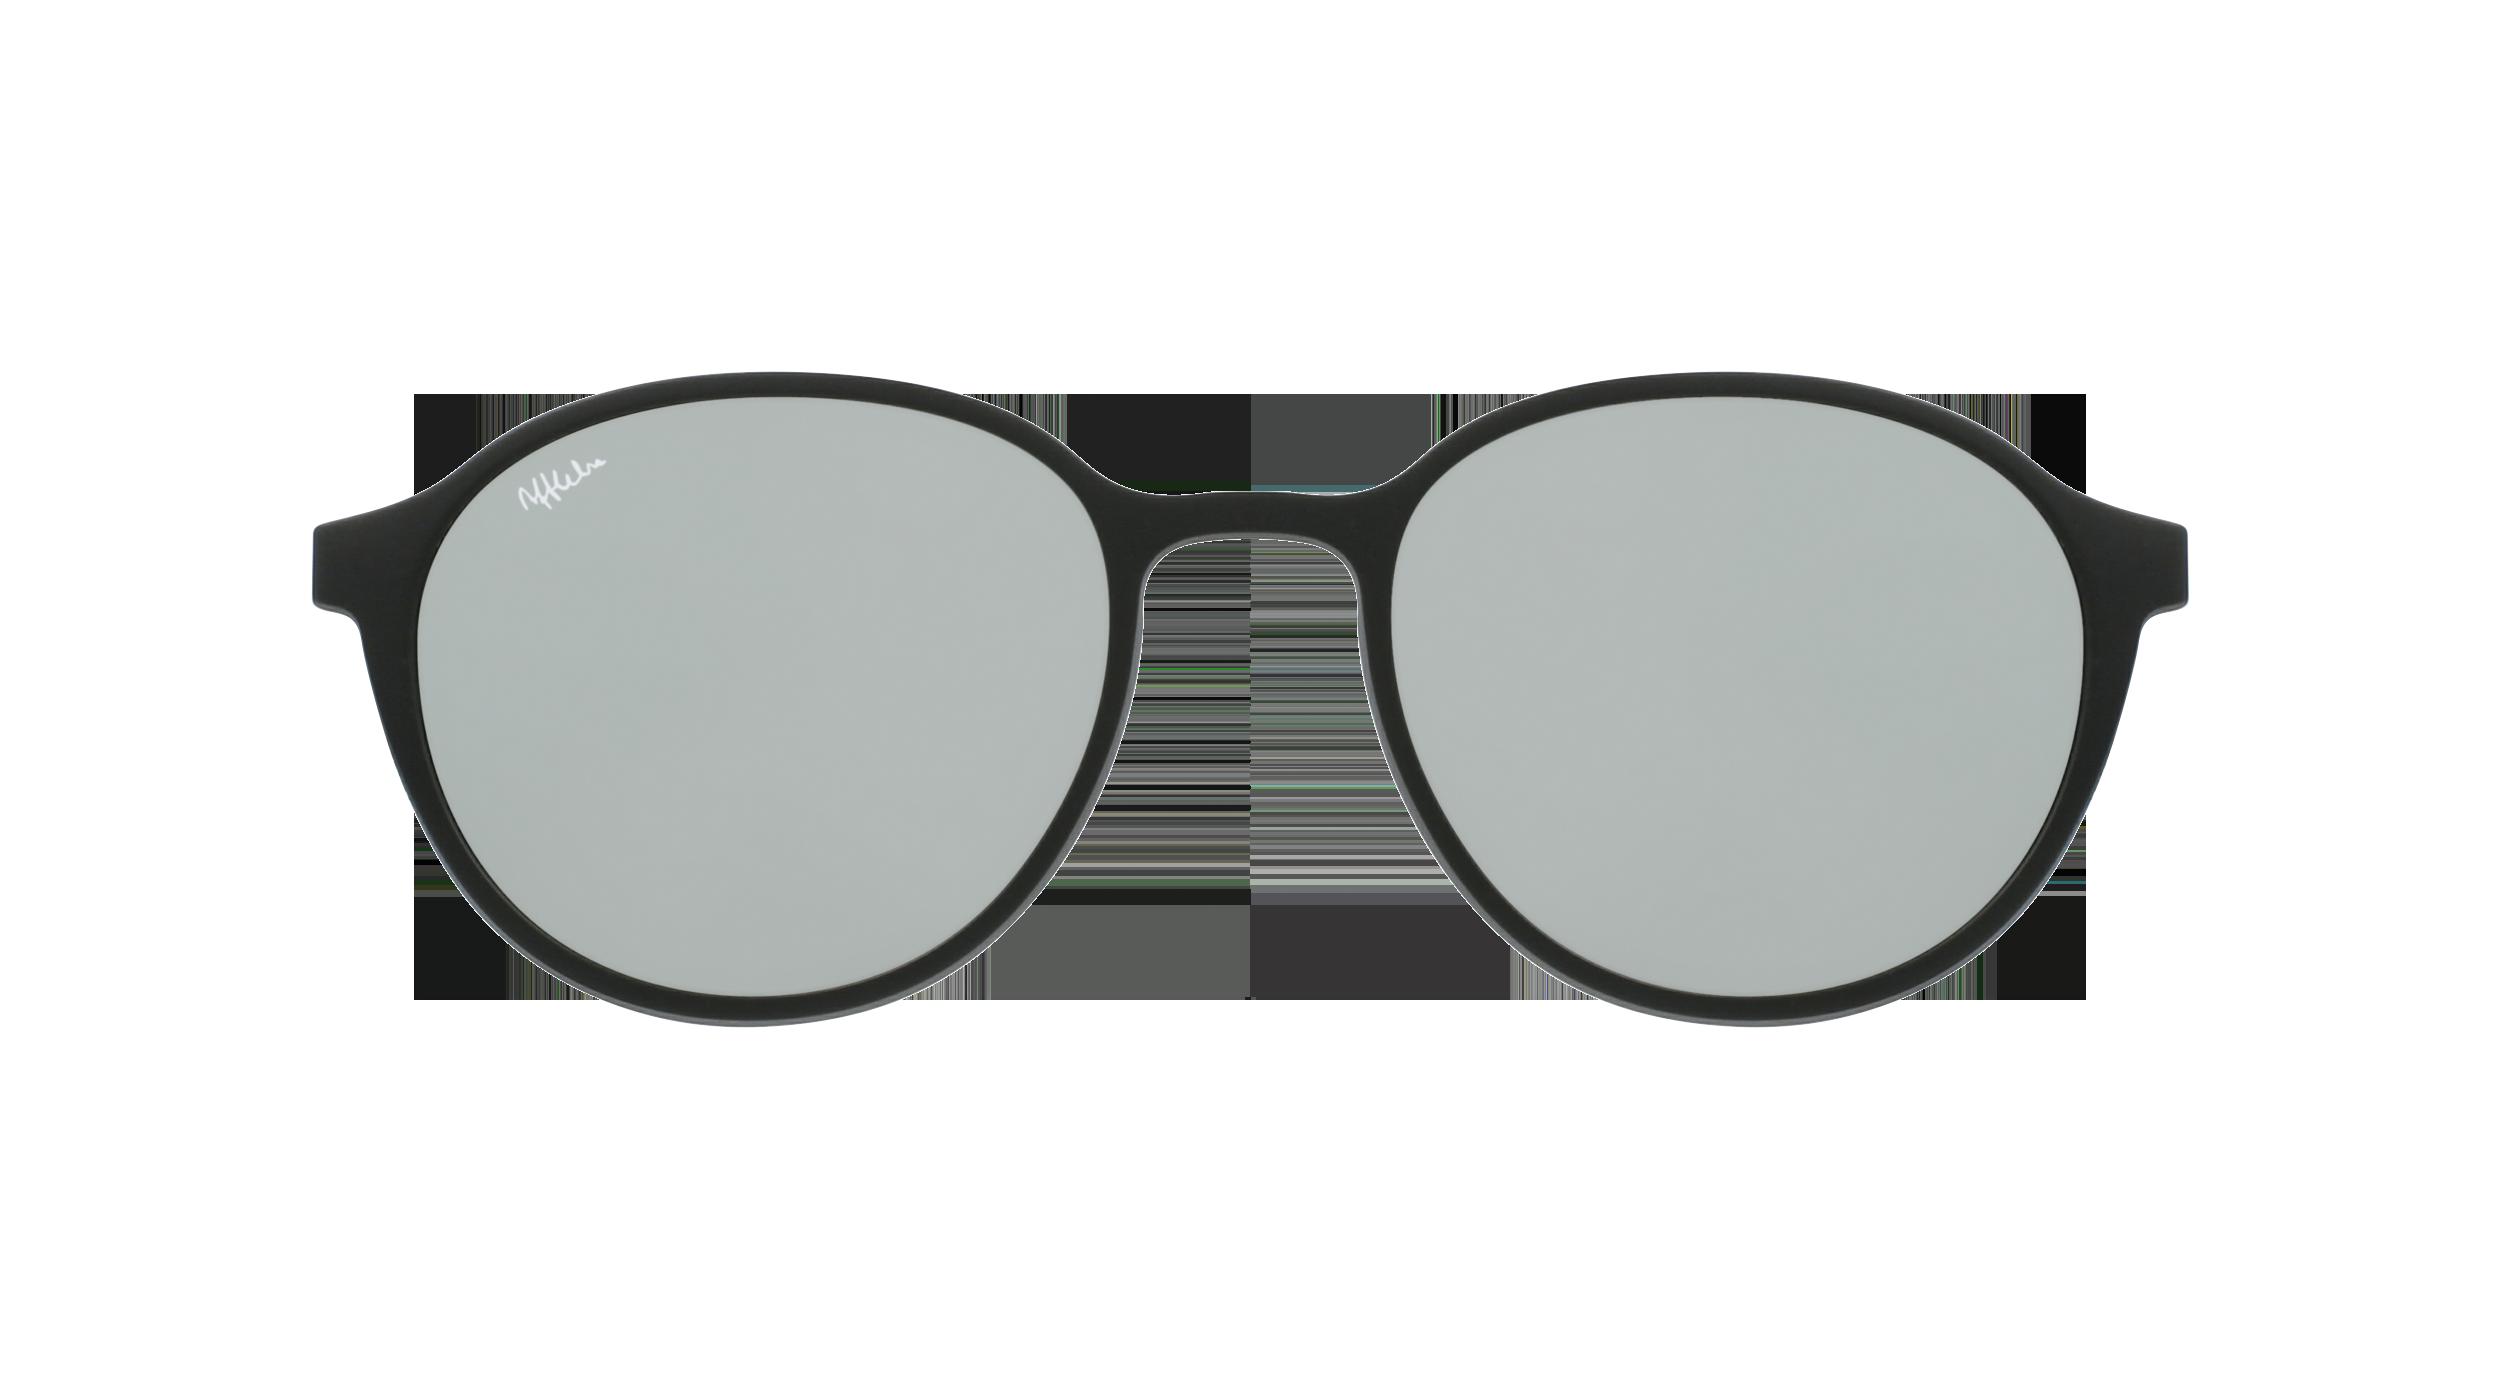 afflelou/france/products/smart_clip/clips_glasses/07630036458808.png